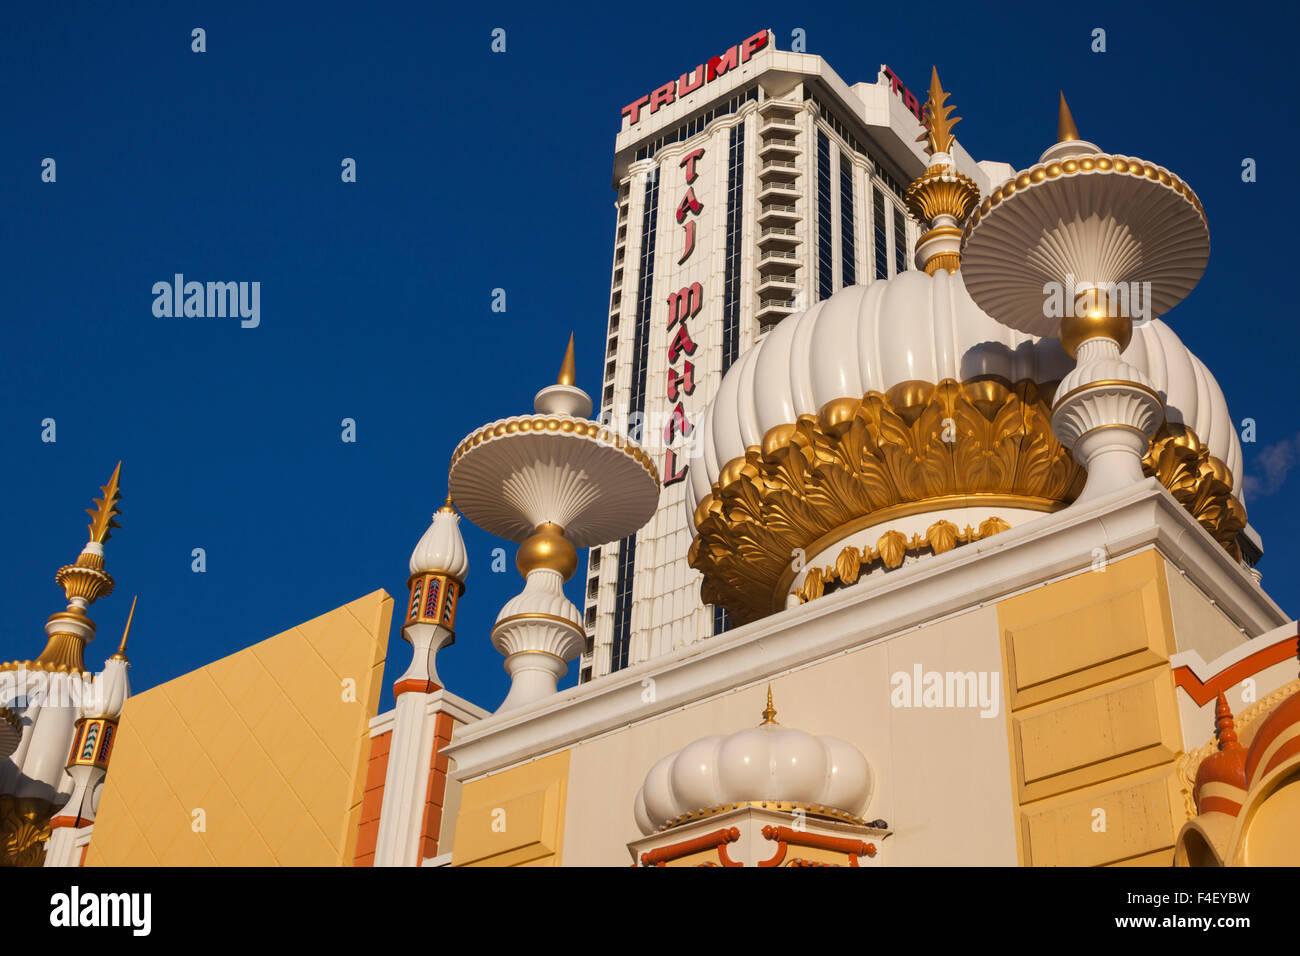 USA, New Jersey, Atlantic City, Promenade und Trump Taj Mahal Hotel und Casino, dawn Stockbild